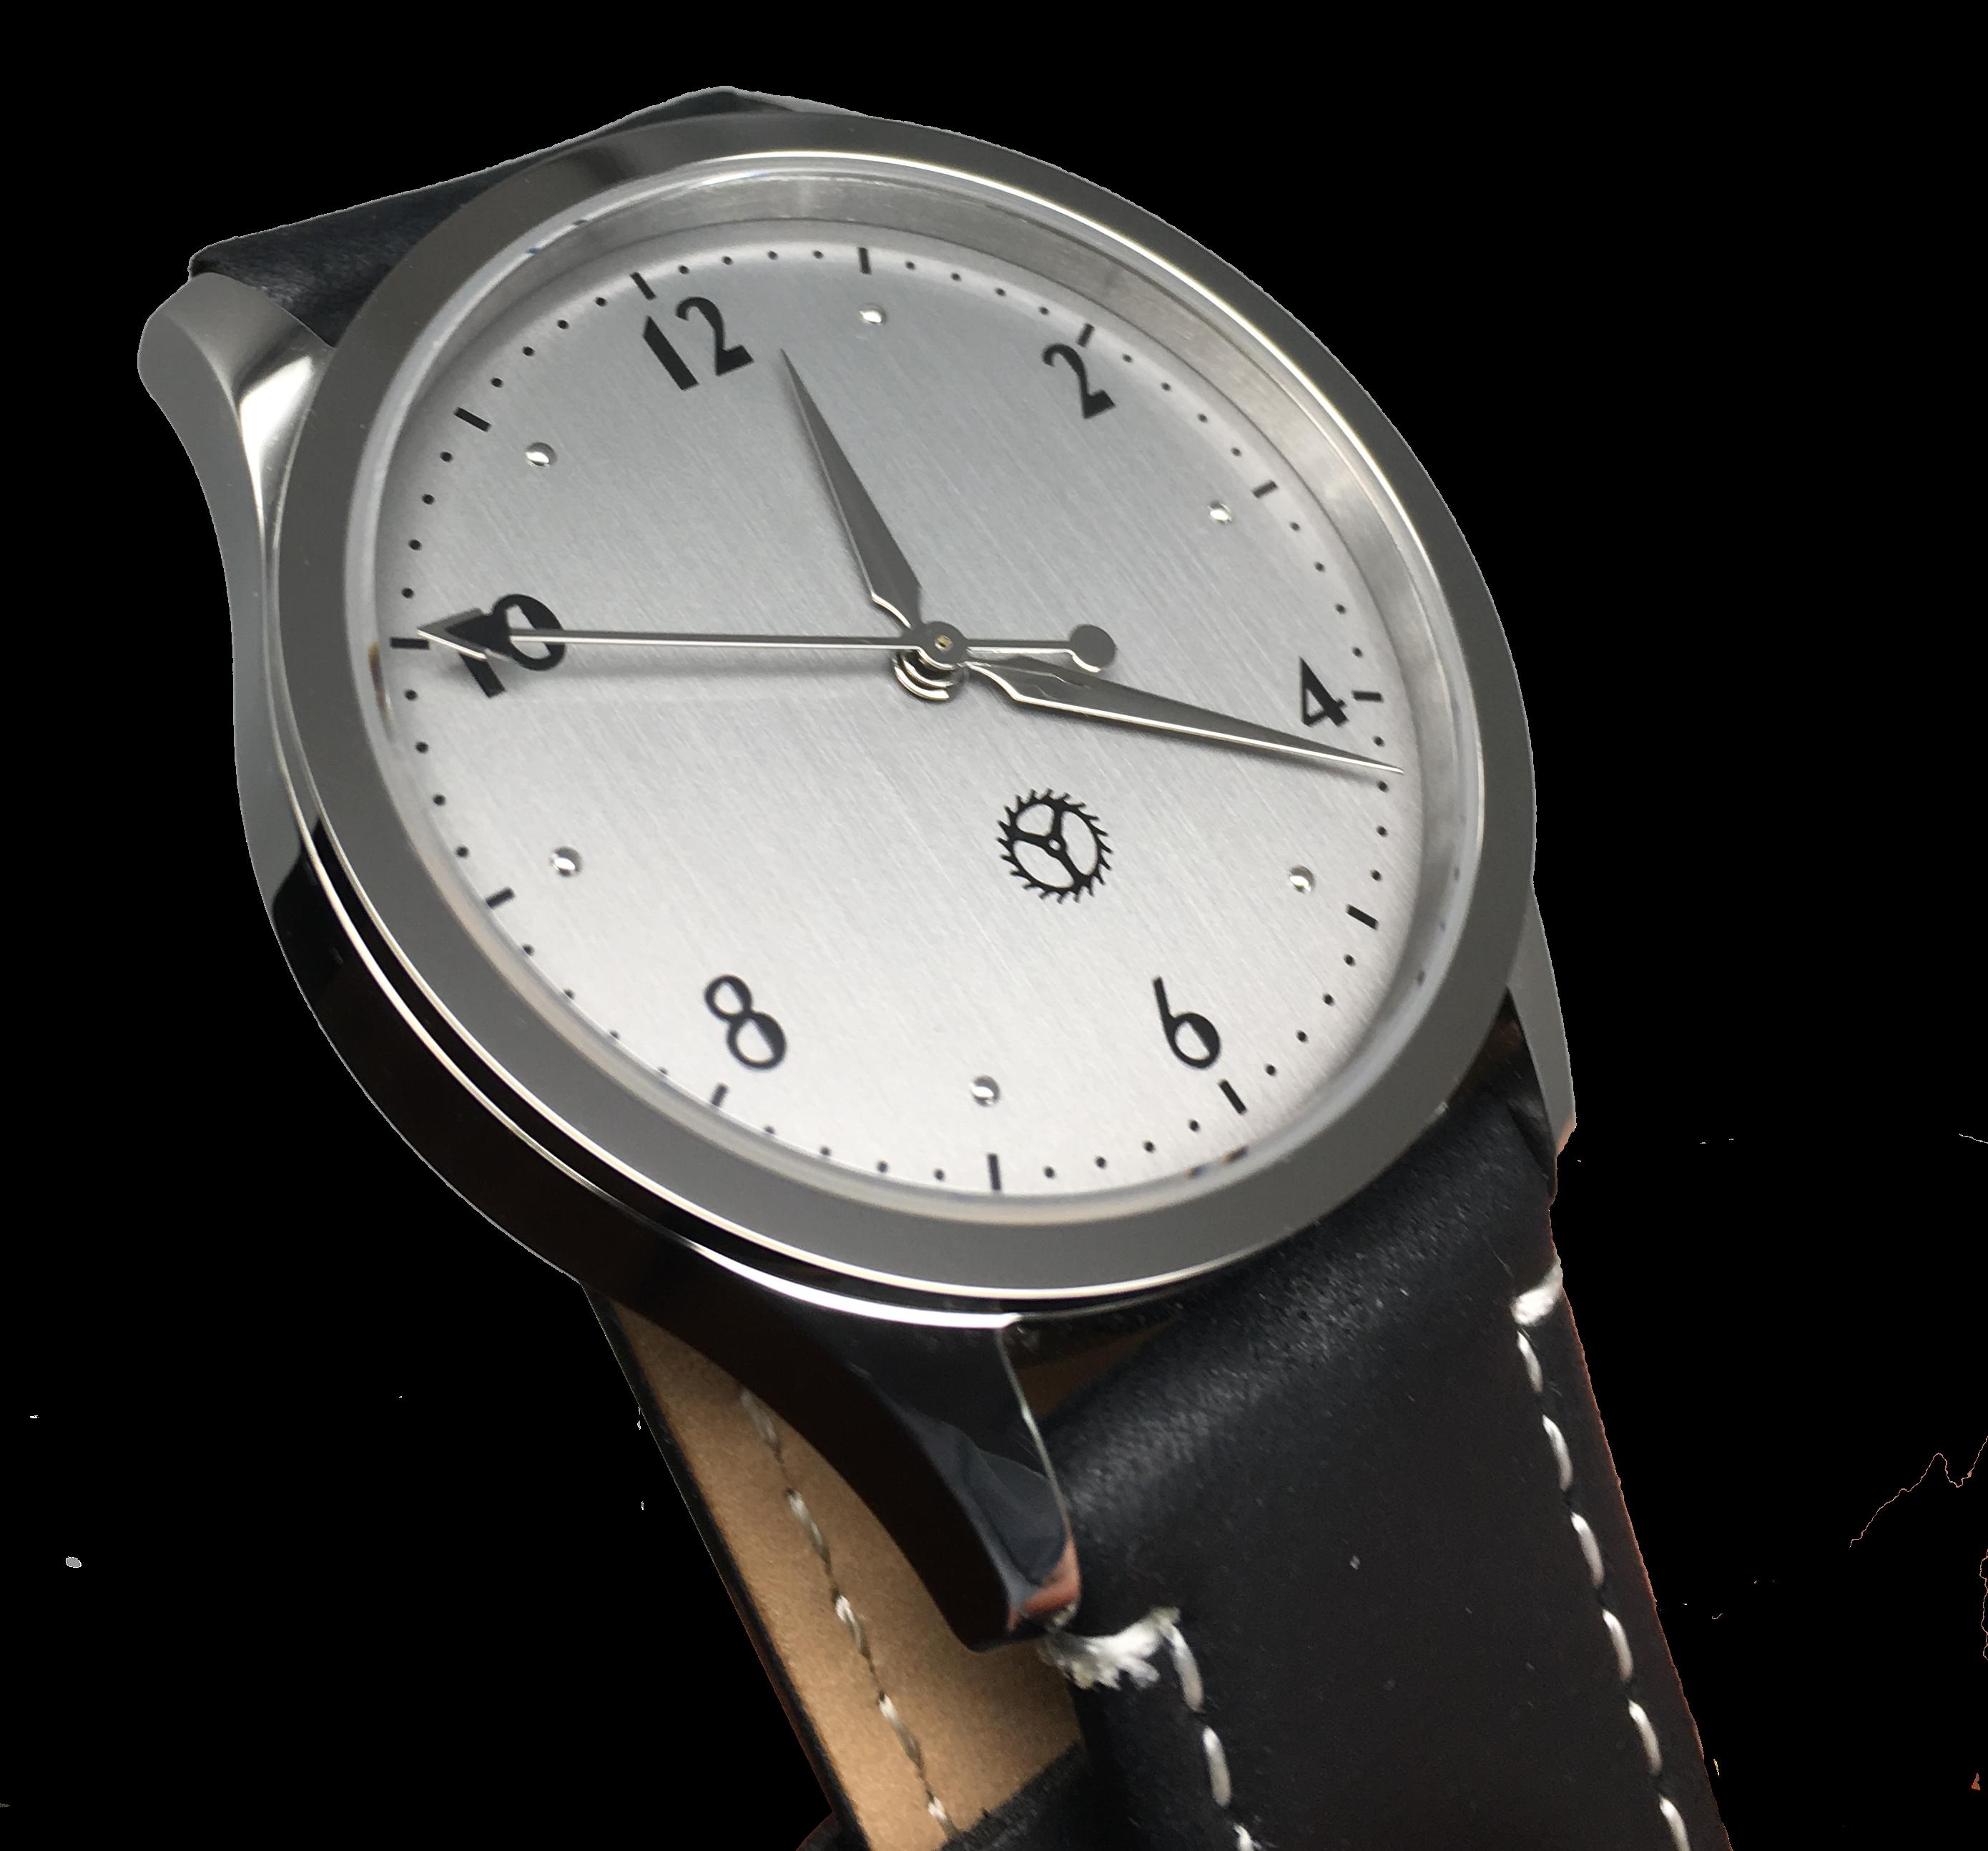 Build Your Own Watch Chronograph Parts Diagram Related Images Vintage Case Design Excellent Top Grade Features